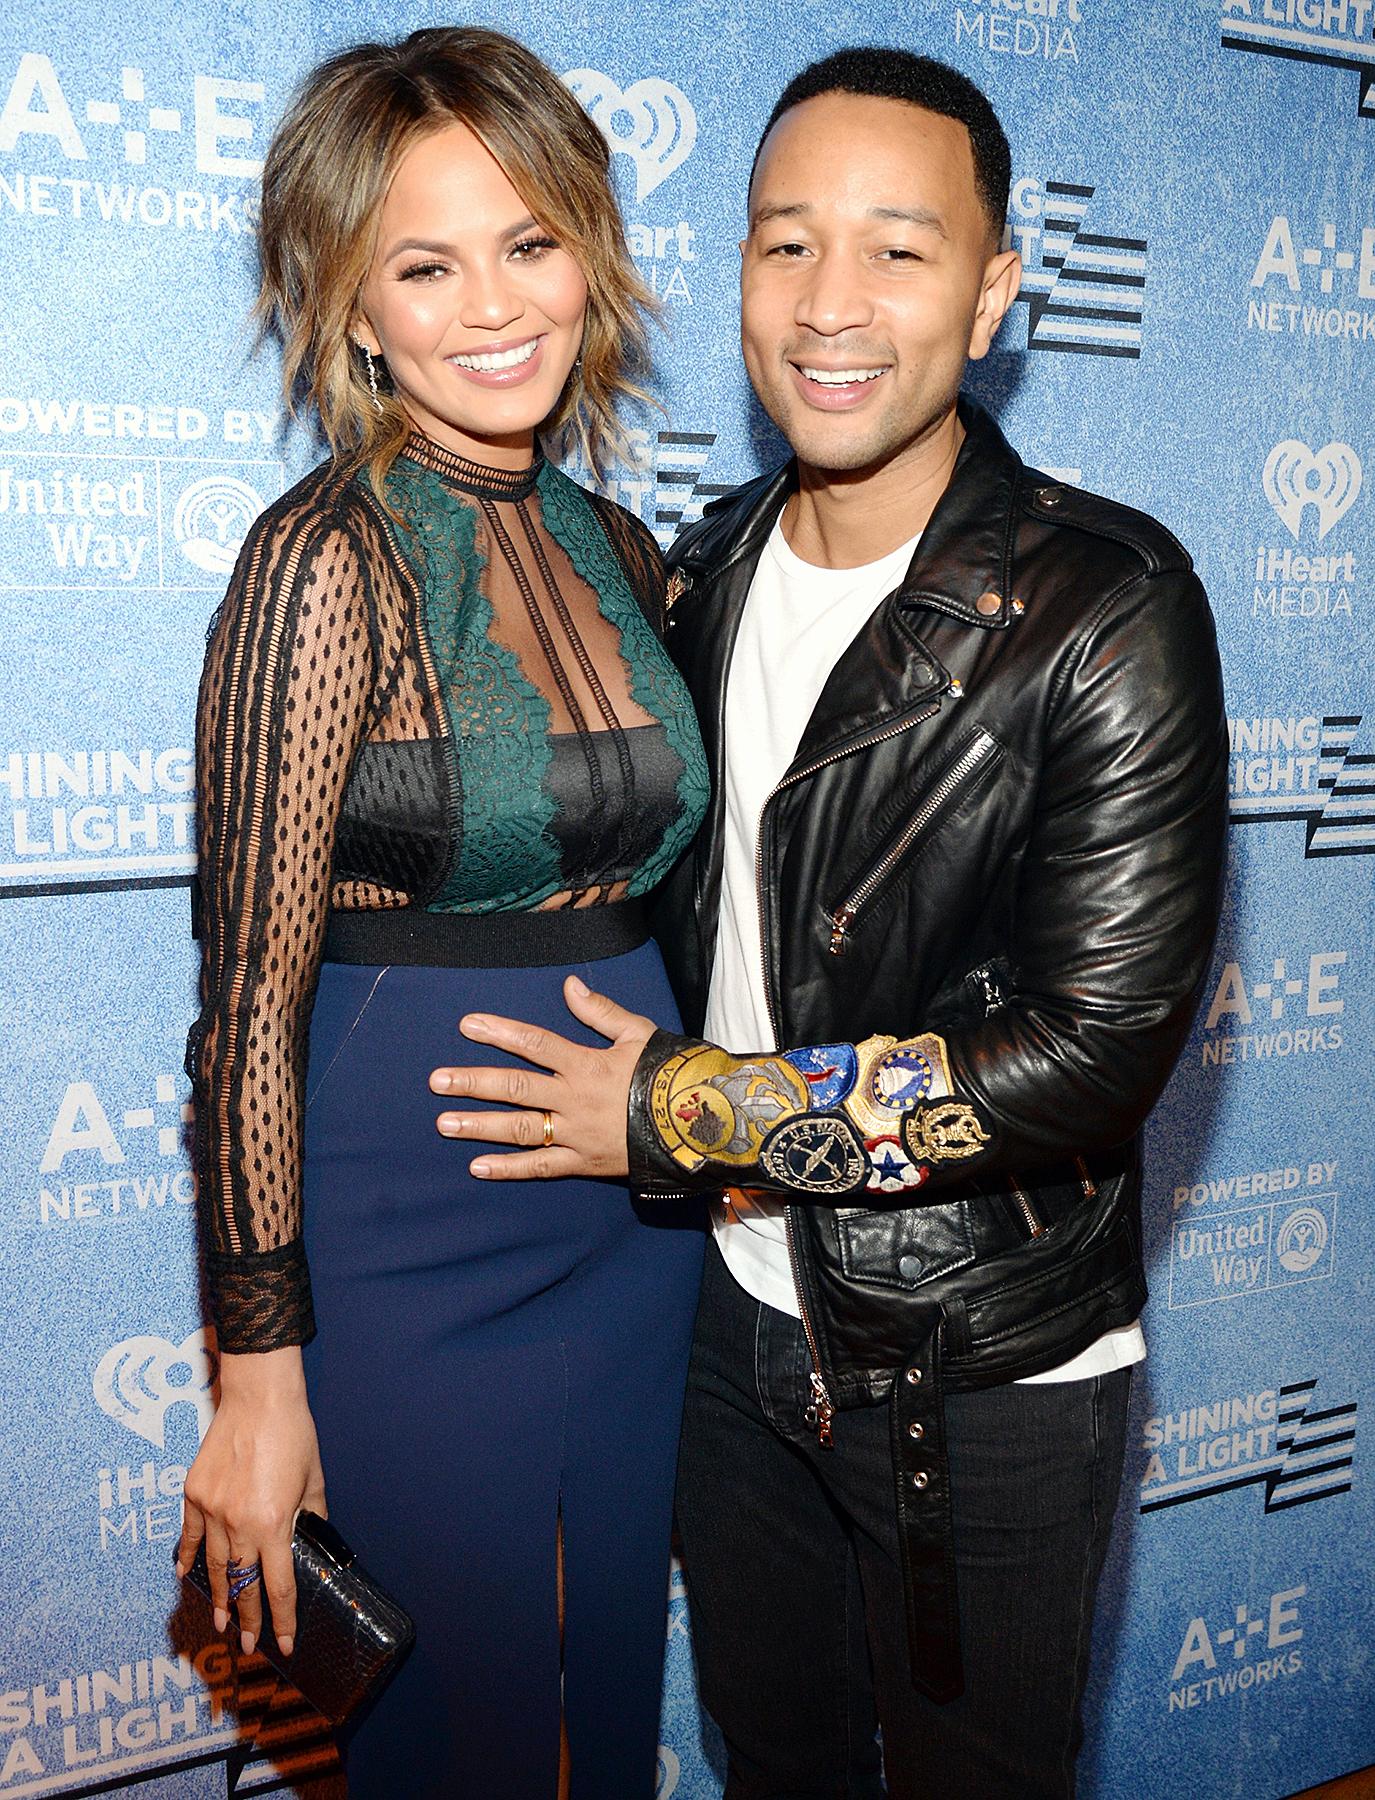 Chrissy Teigen and John Legend attend A+E Networks